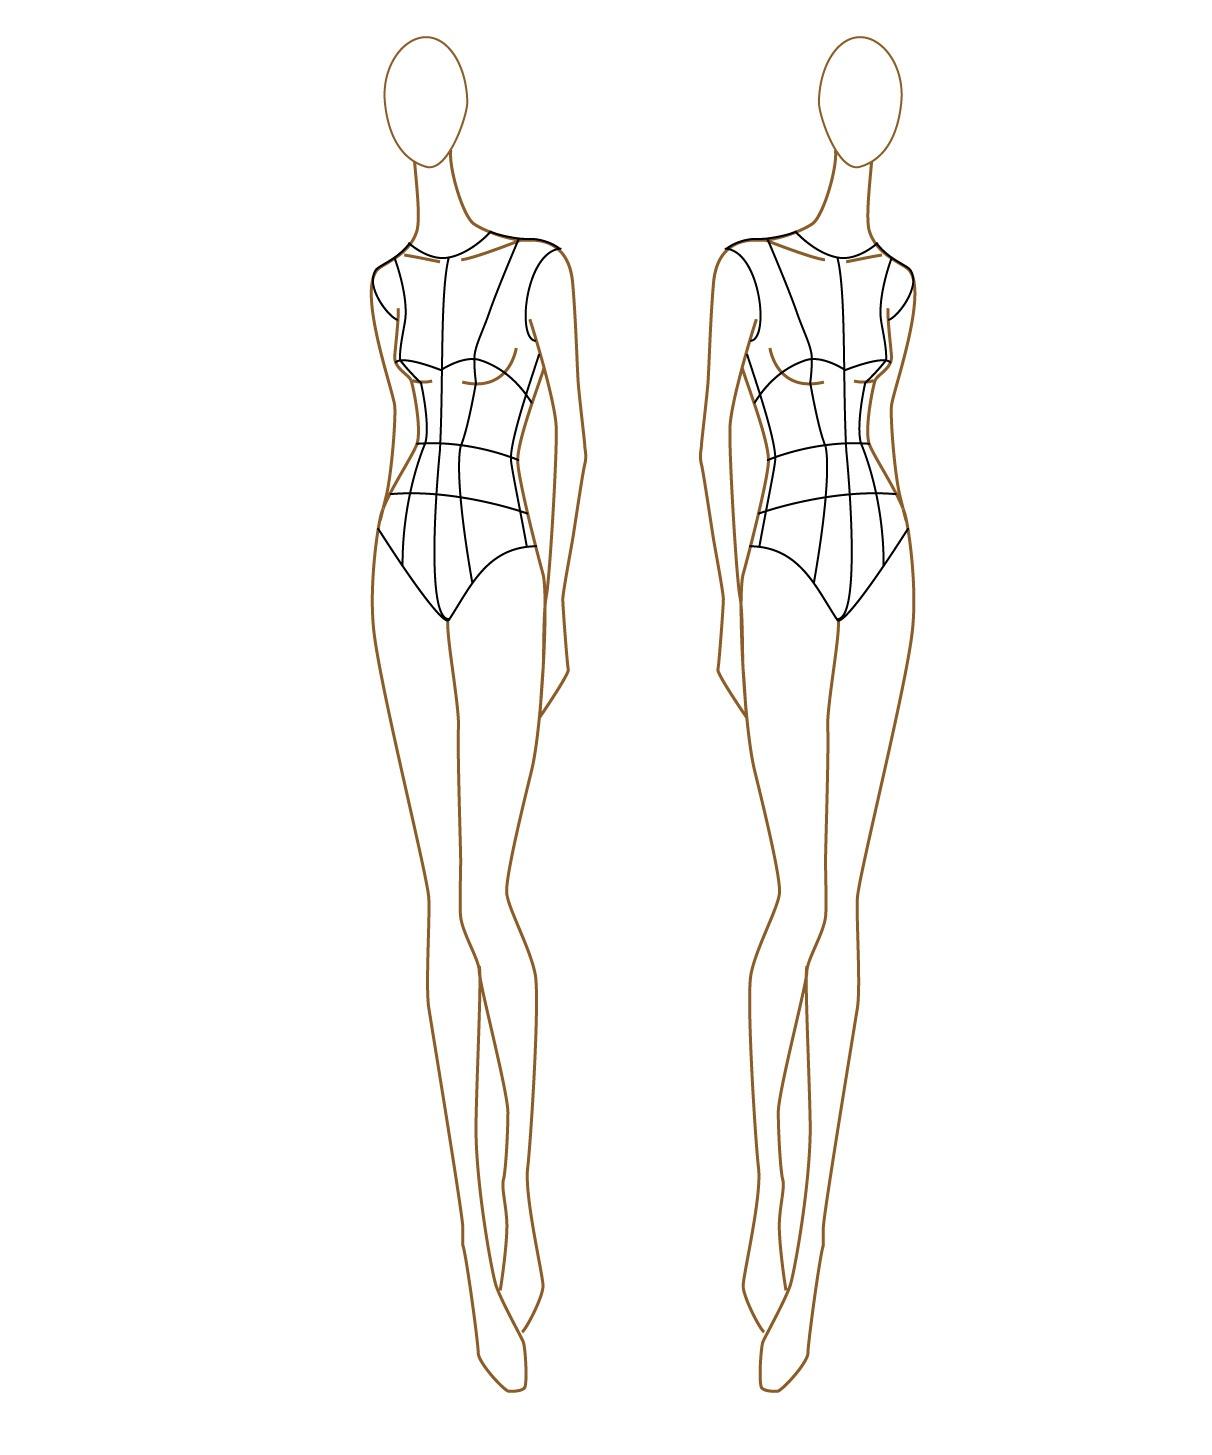 Fashion Templates - 33+ Free Designs, Inspiration, Jpg, Format - Free Printable Fashion Model Templates